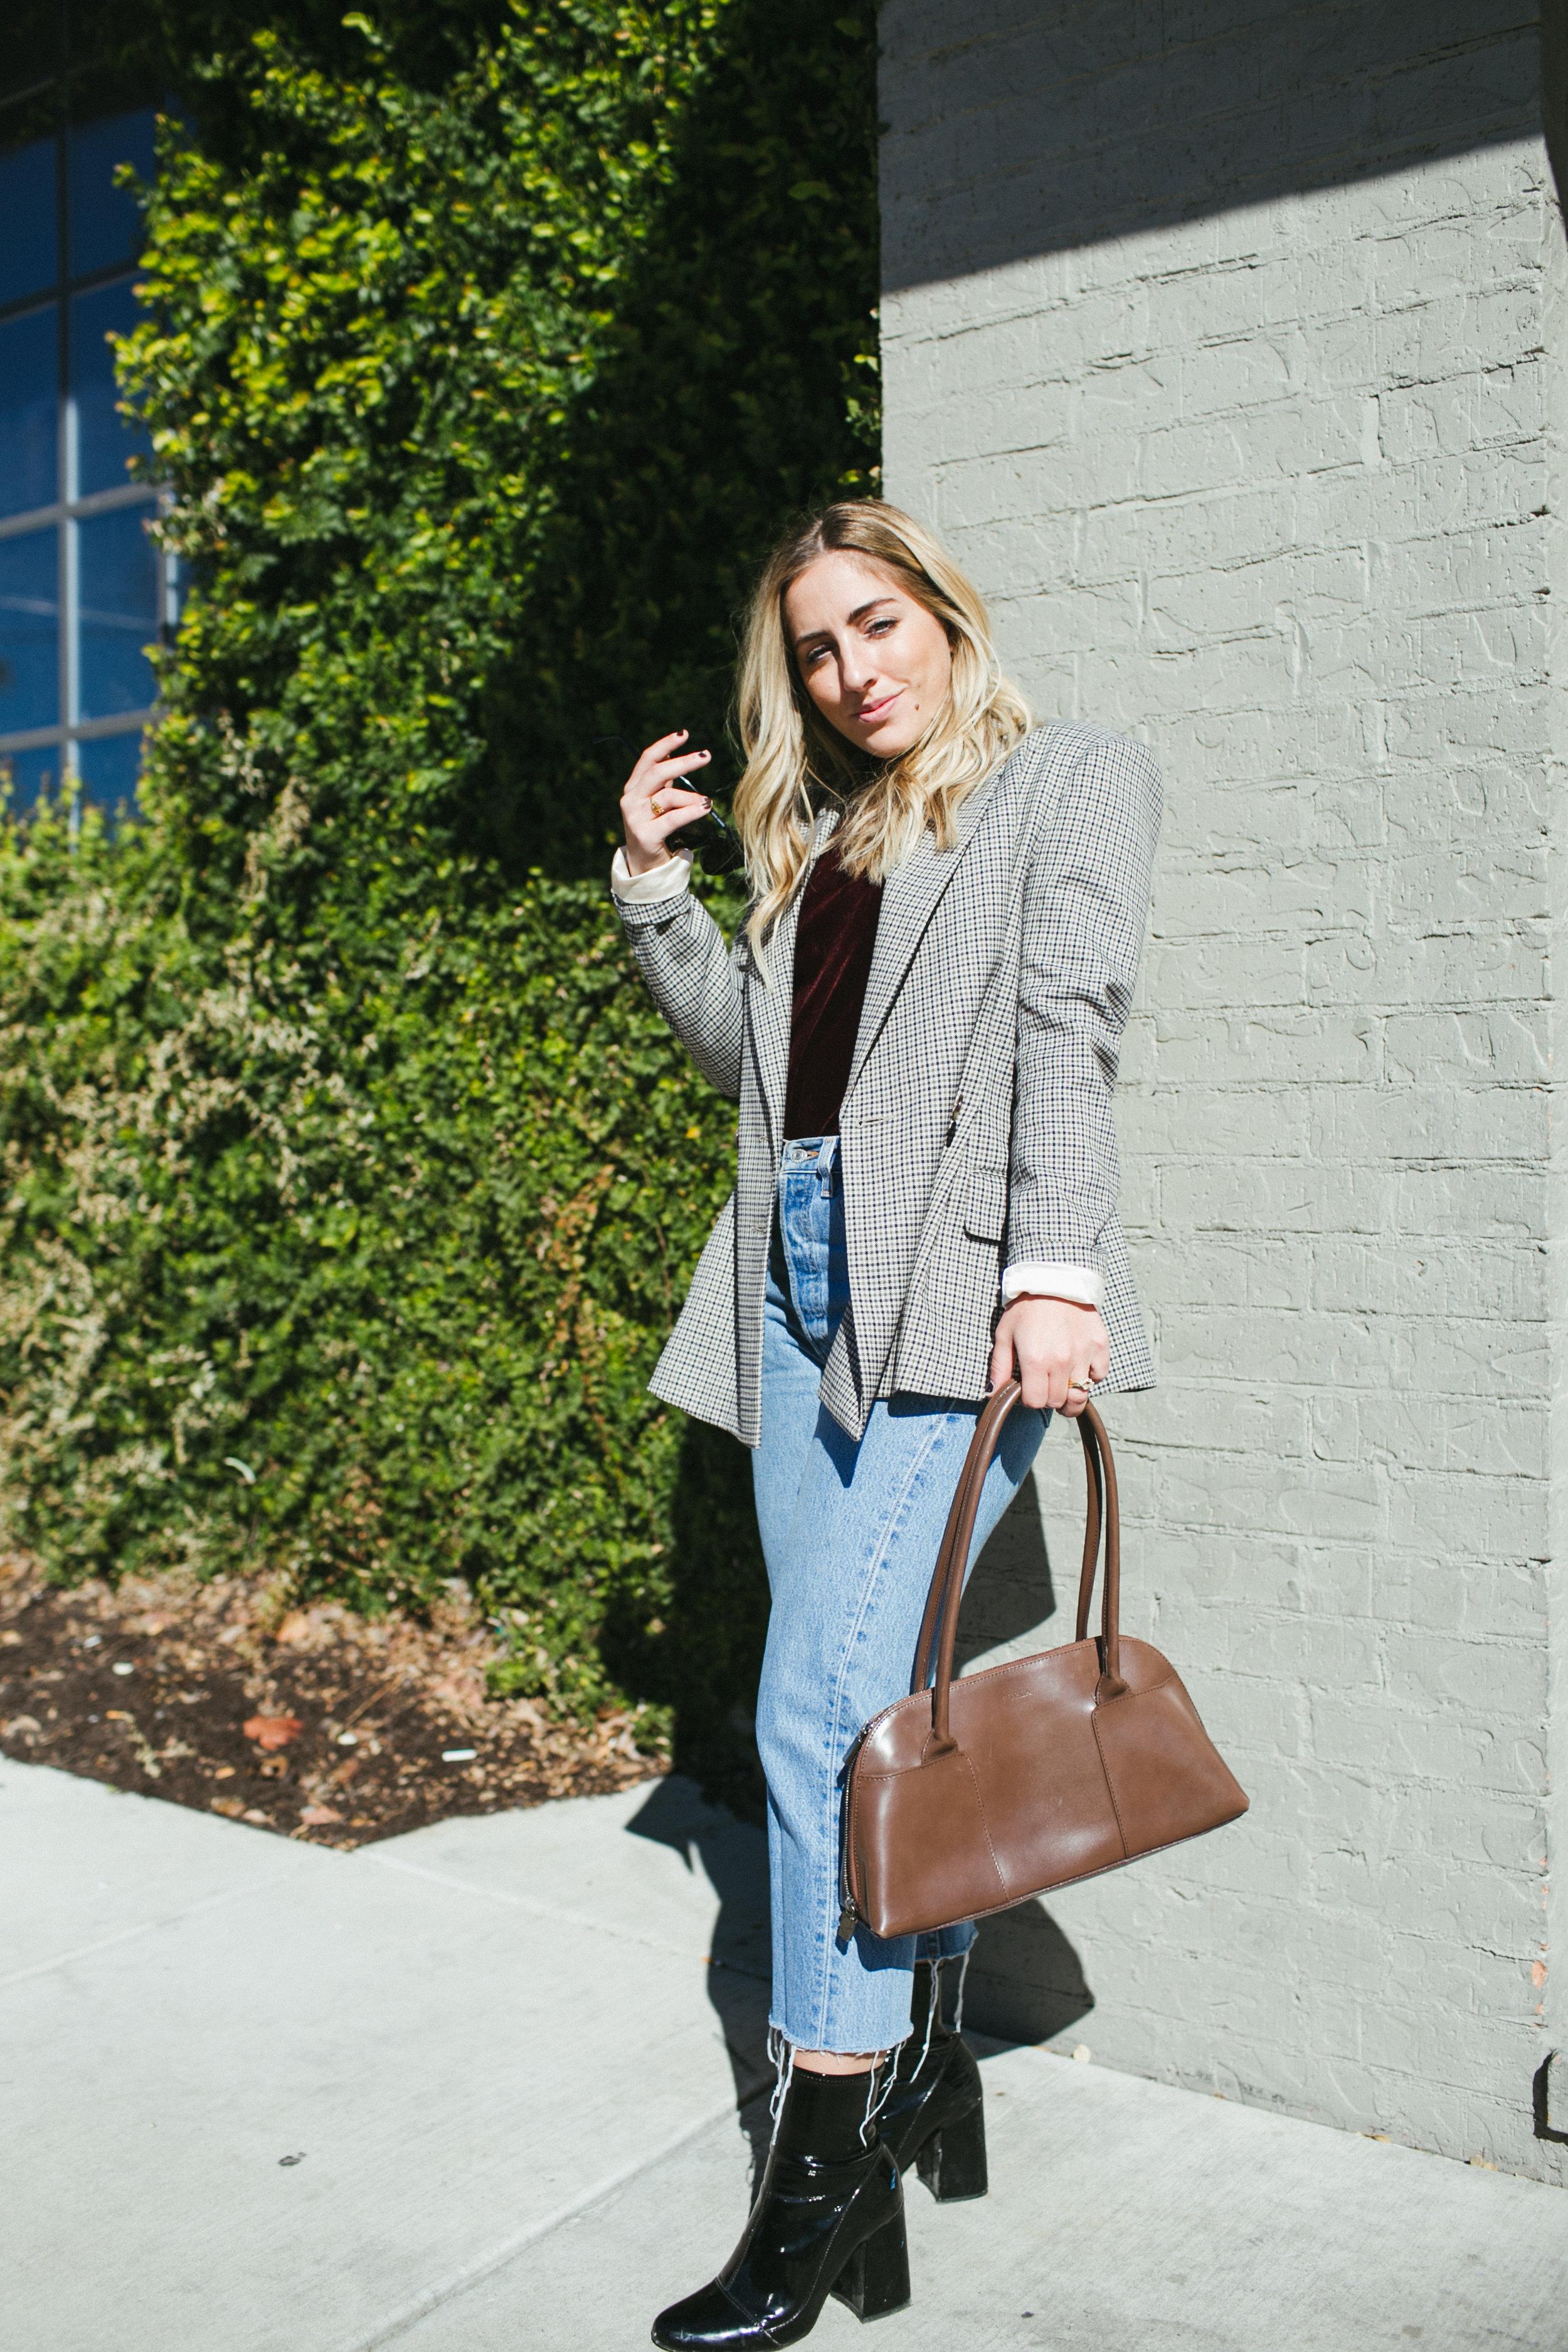 Paige-Newton-Lifestyle-Fashion-Blogger-Influencer-Photography-003.jpg